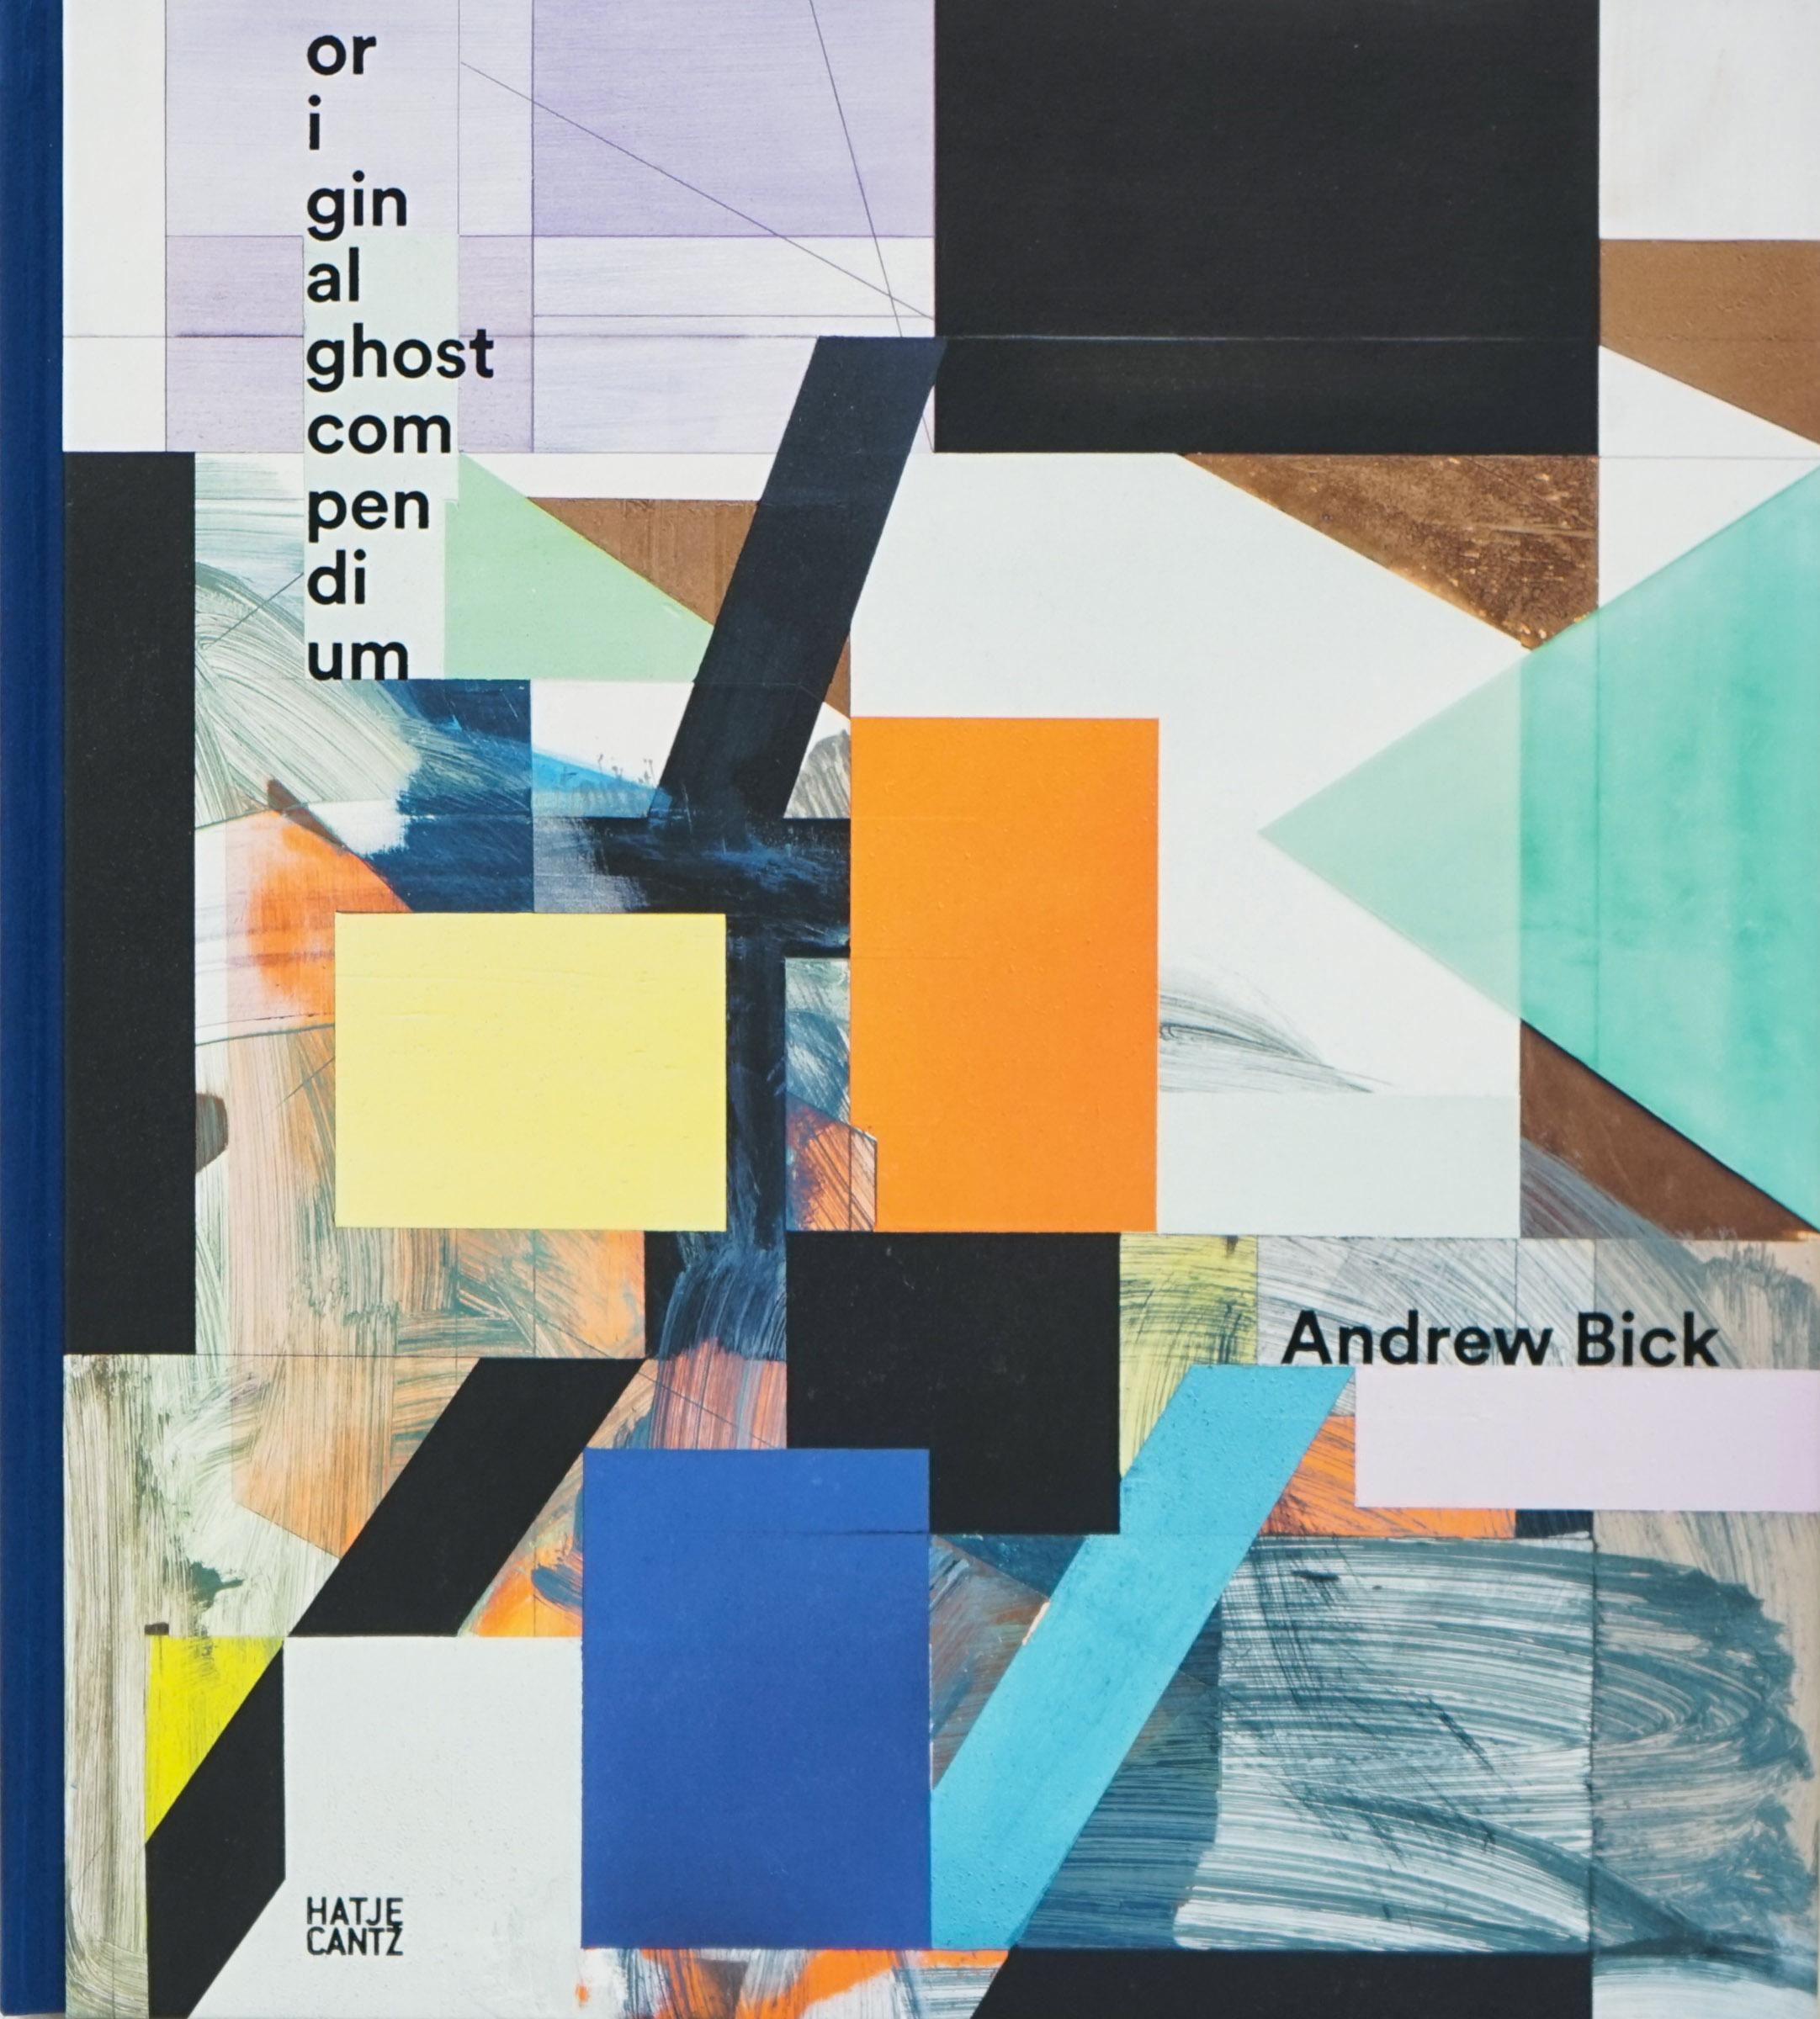 Book no. 0: Andrew Bick